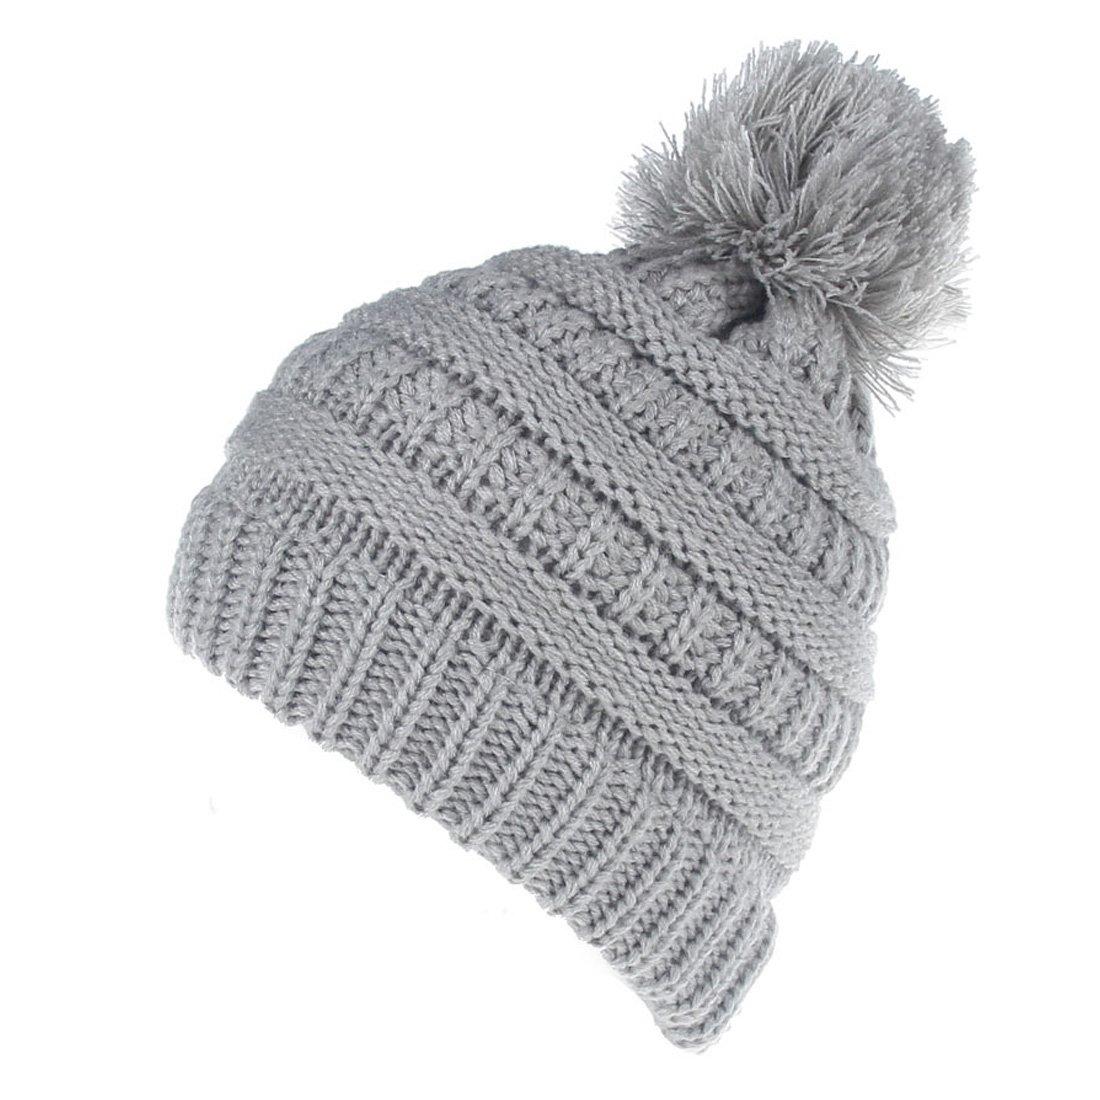 Topcoco Newborn Baby Girls Boys Winter Hat Knitted Pom Pom Skull Caps TPXMZ51-2